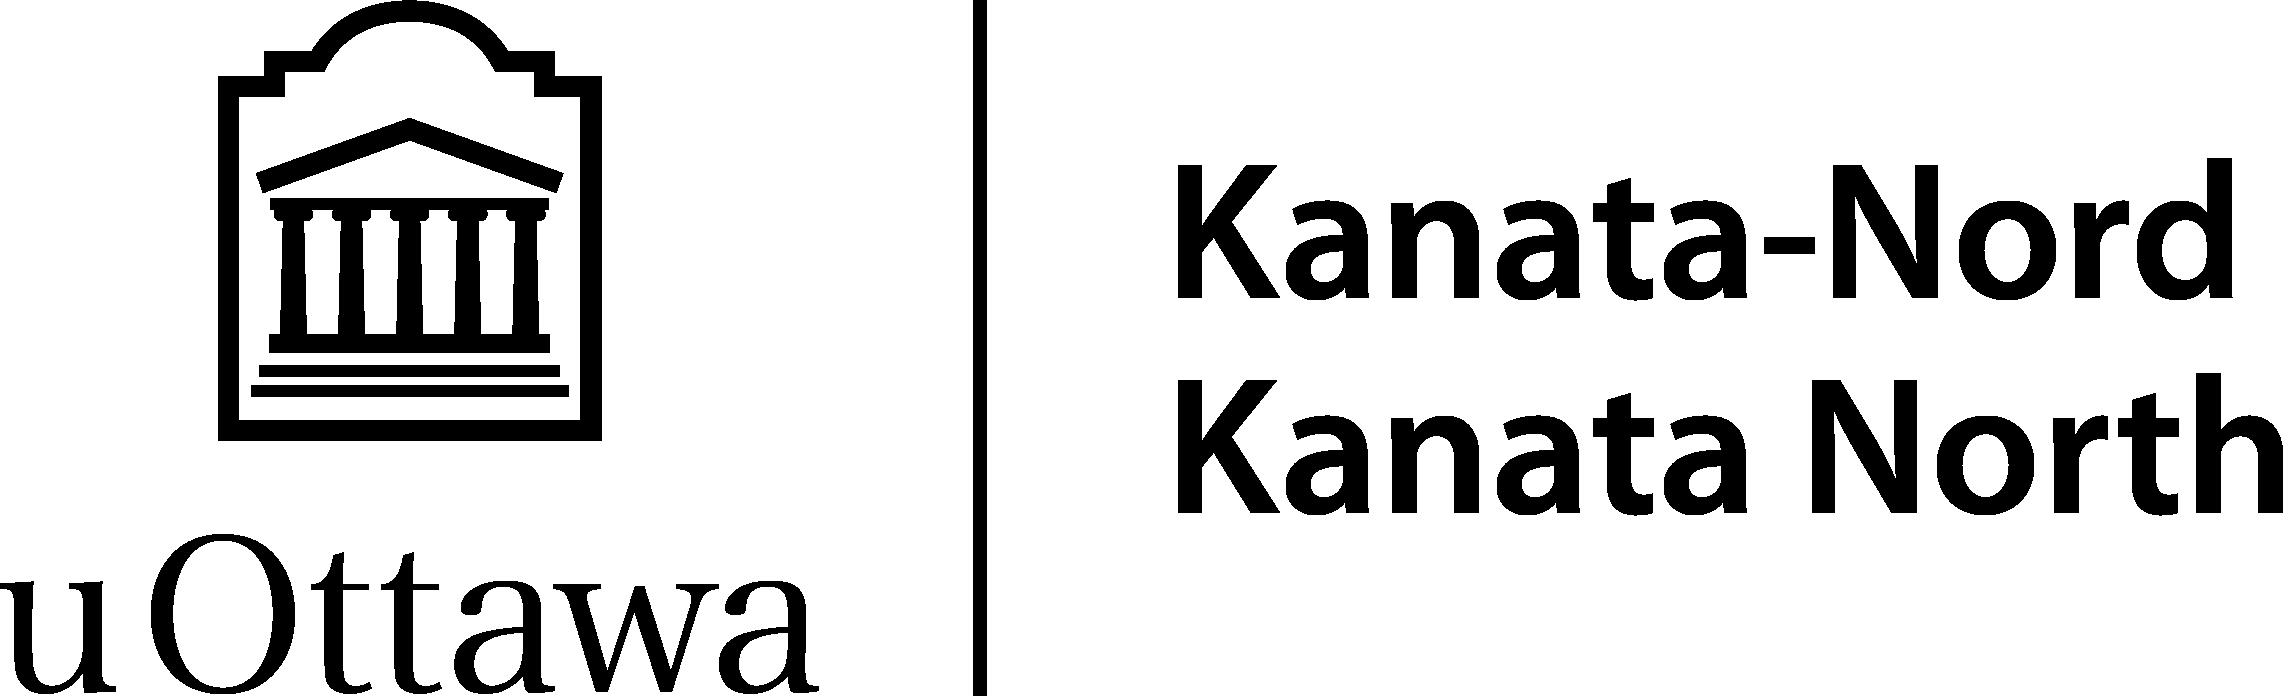 uOttawa - Kanata North logo